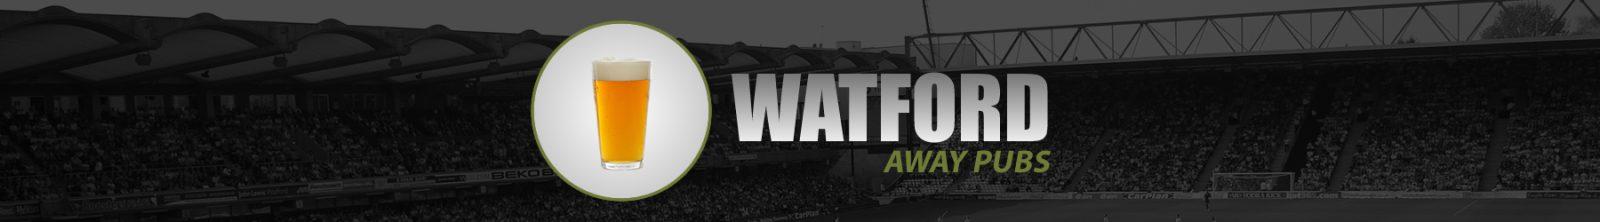 Watford Away Pubs